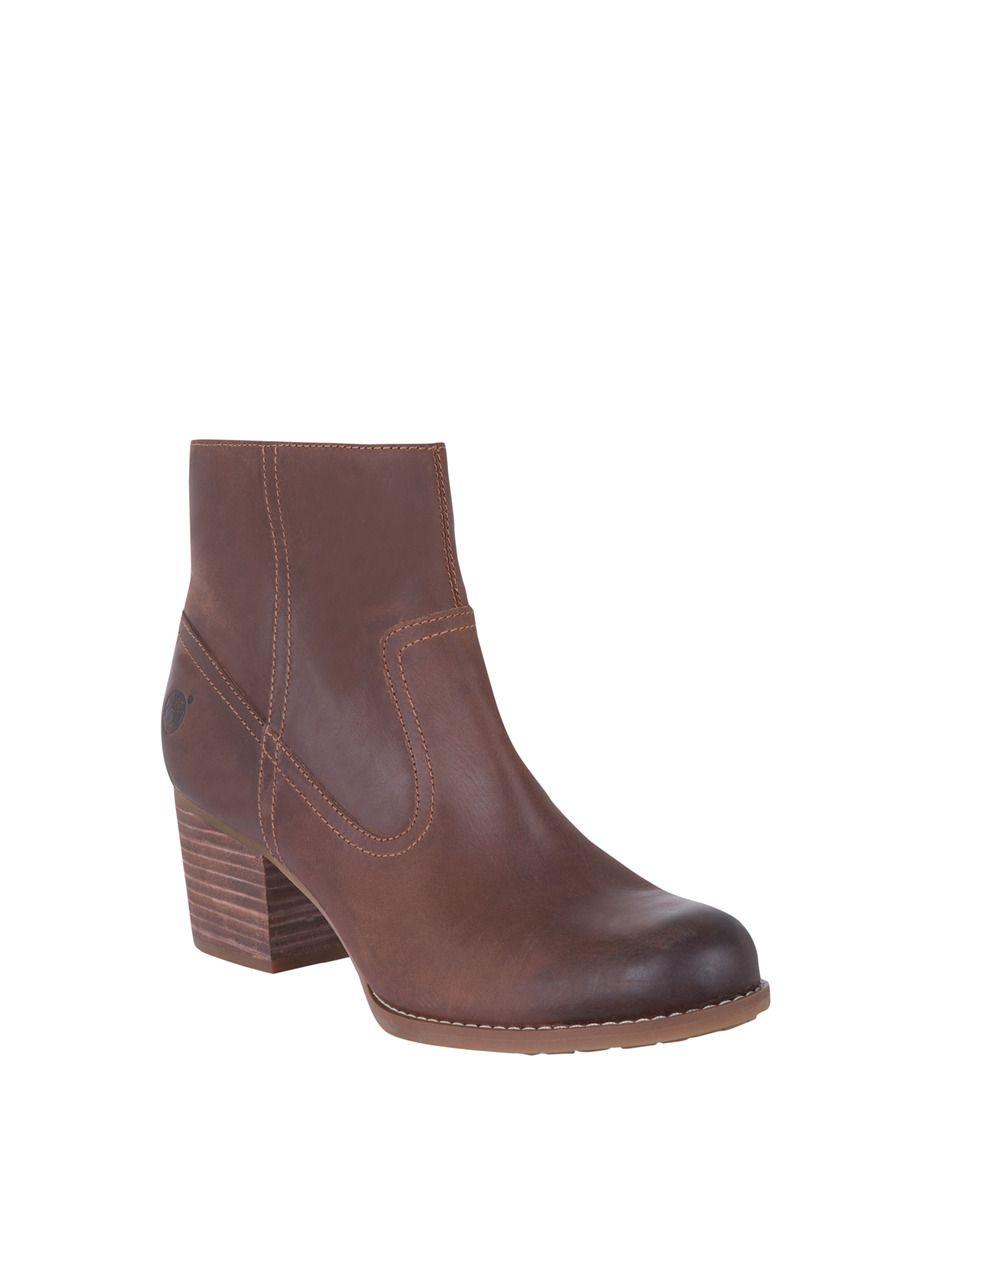 El Botines Zapatos Mujer Inglés Timberland De Corte qqxSOgpw